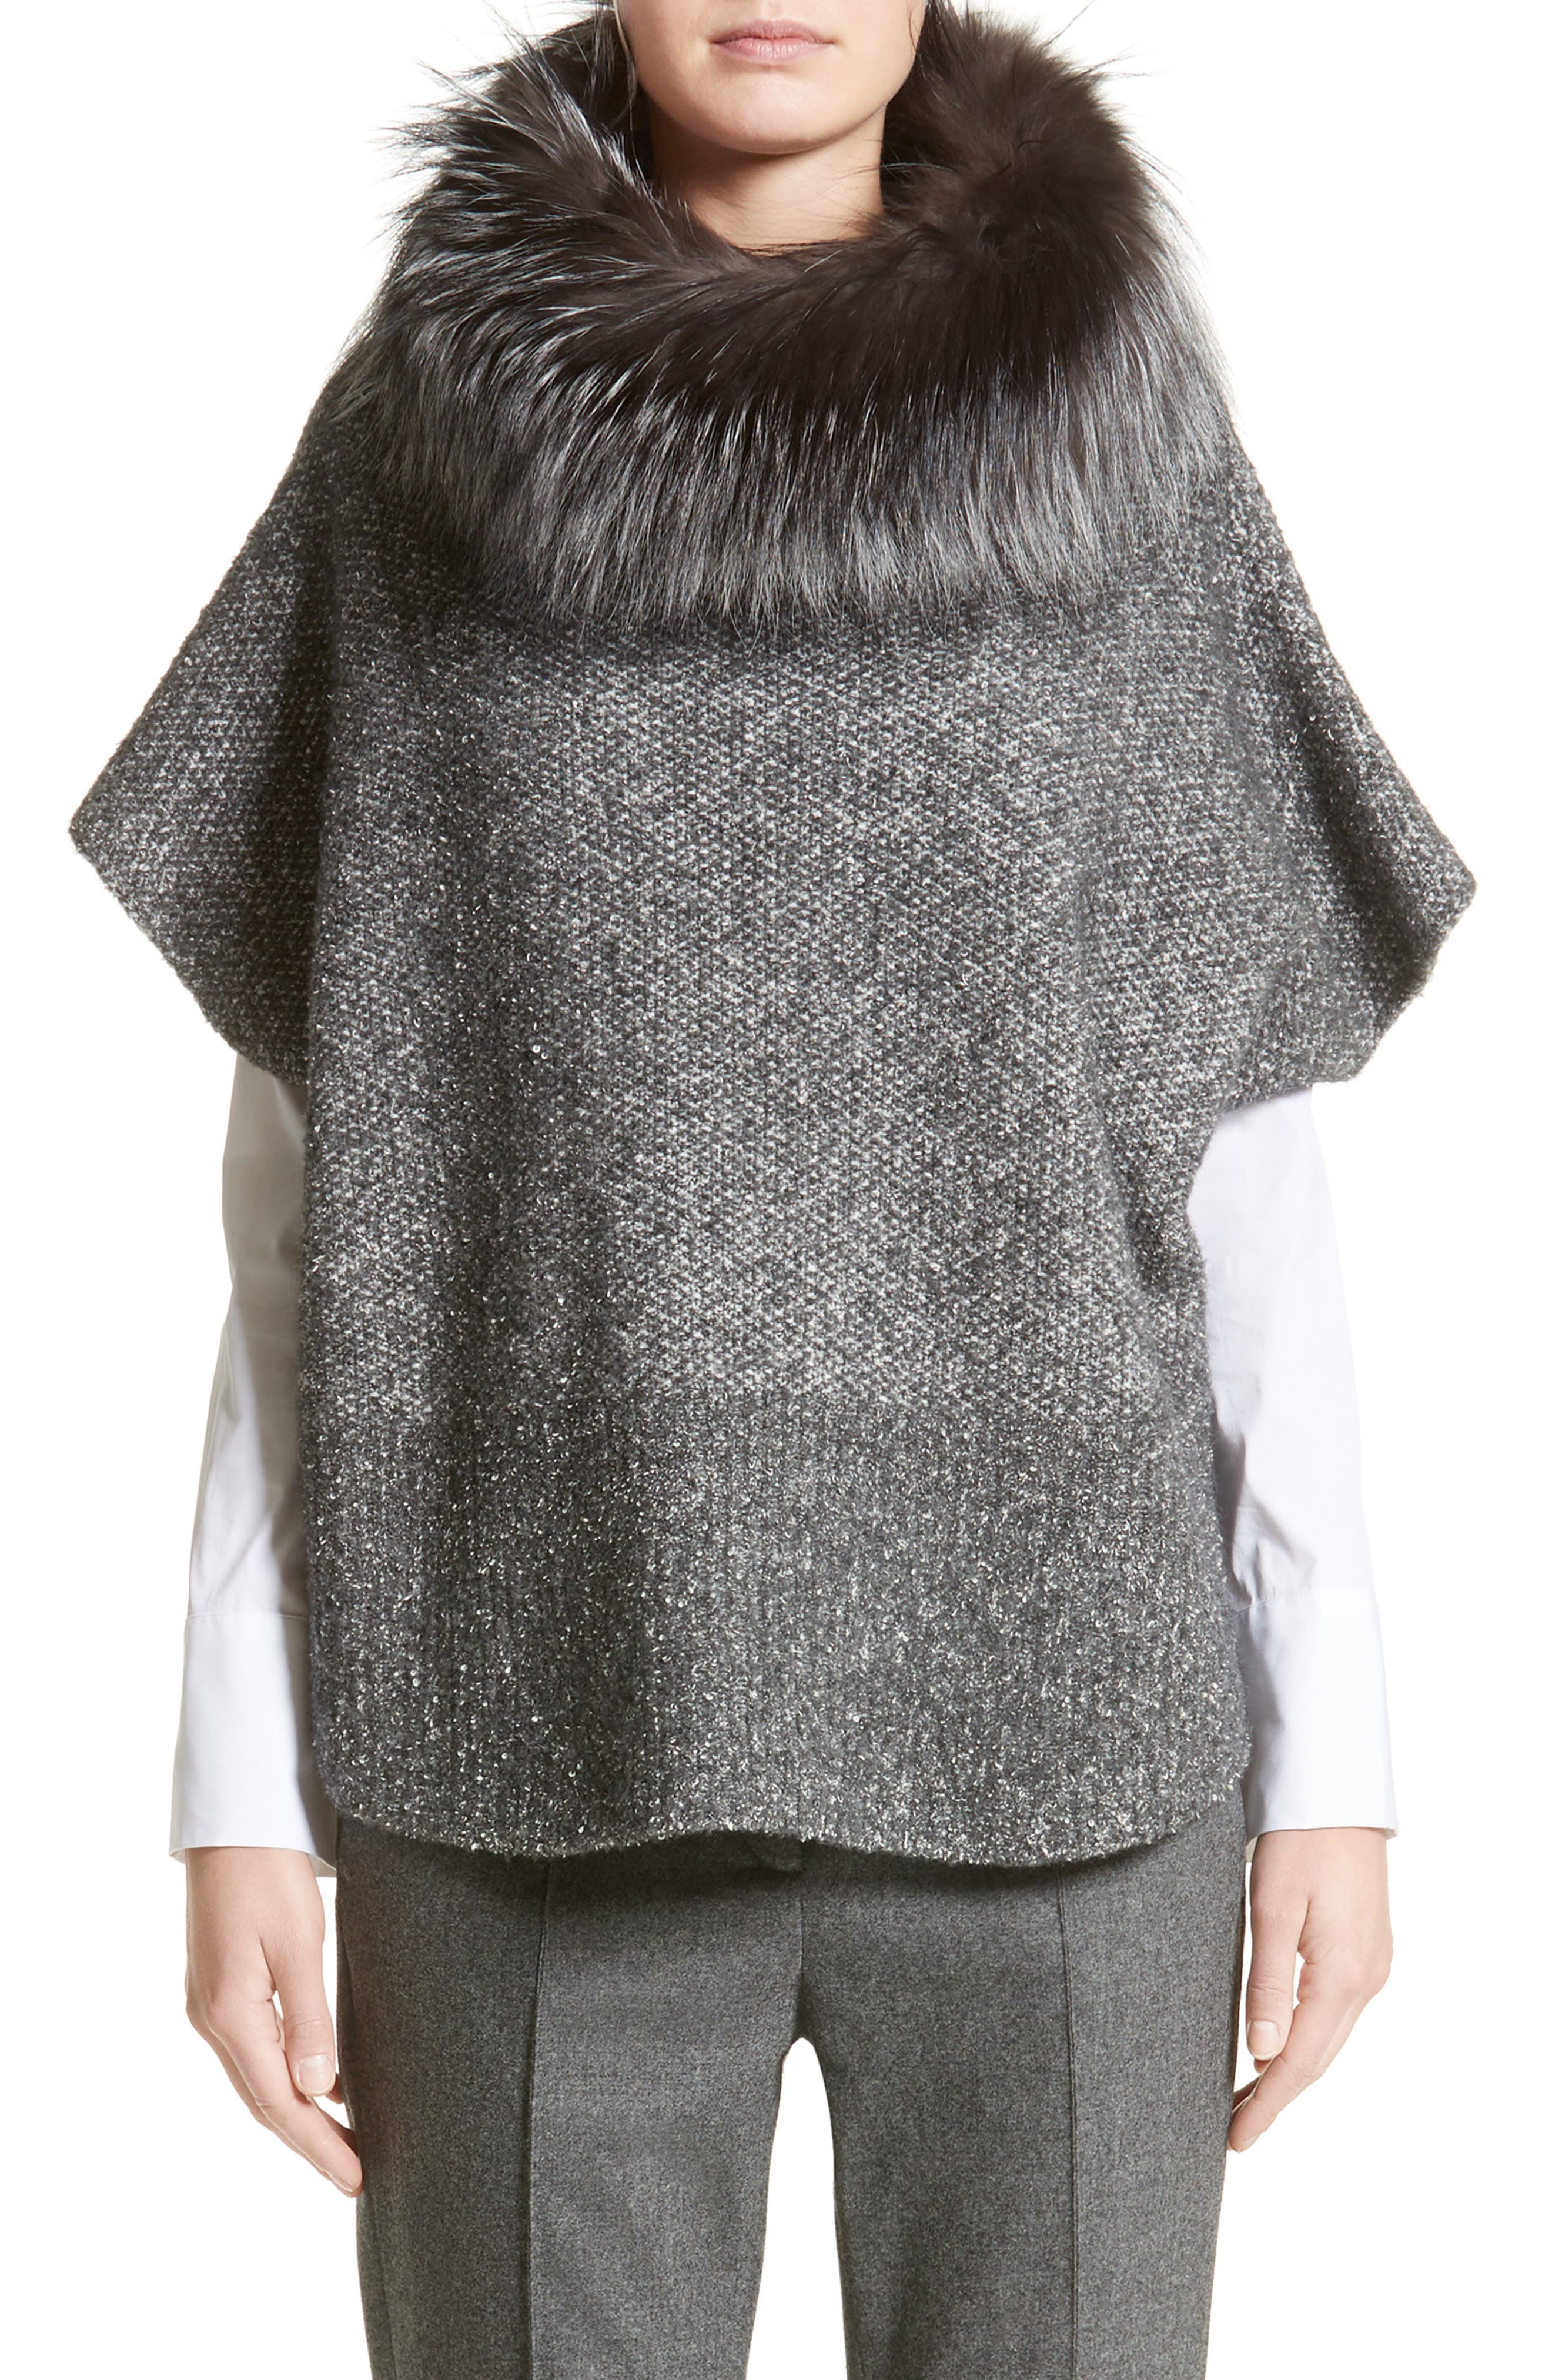 Pebble Tweed Knit Poncho with Genuine Fox Fur Collar,                             Main thumbnail 1, color,